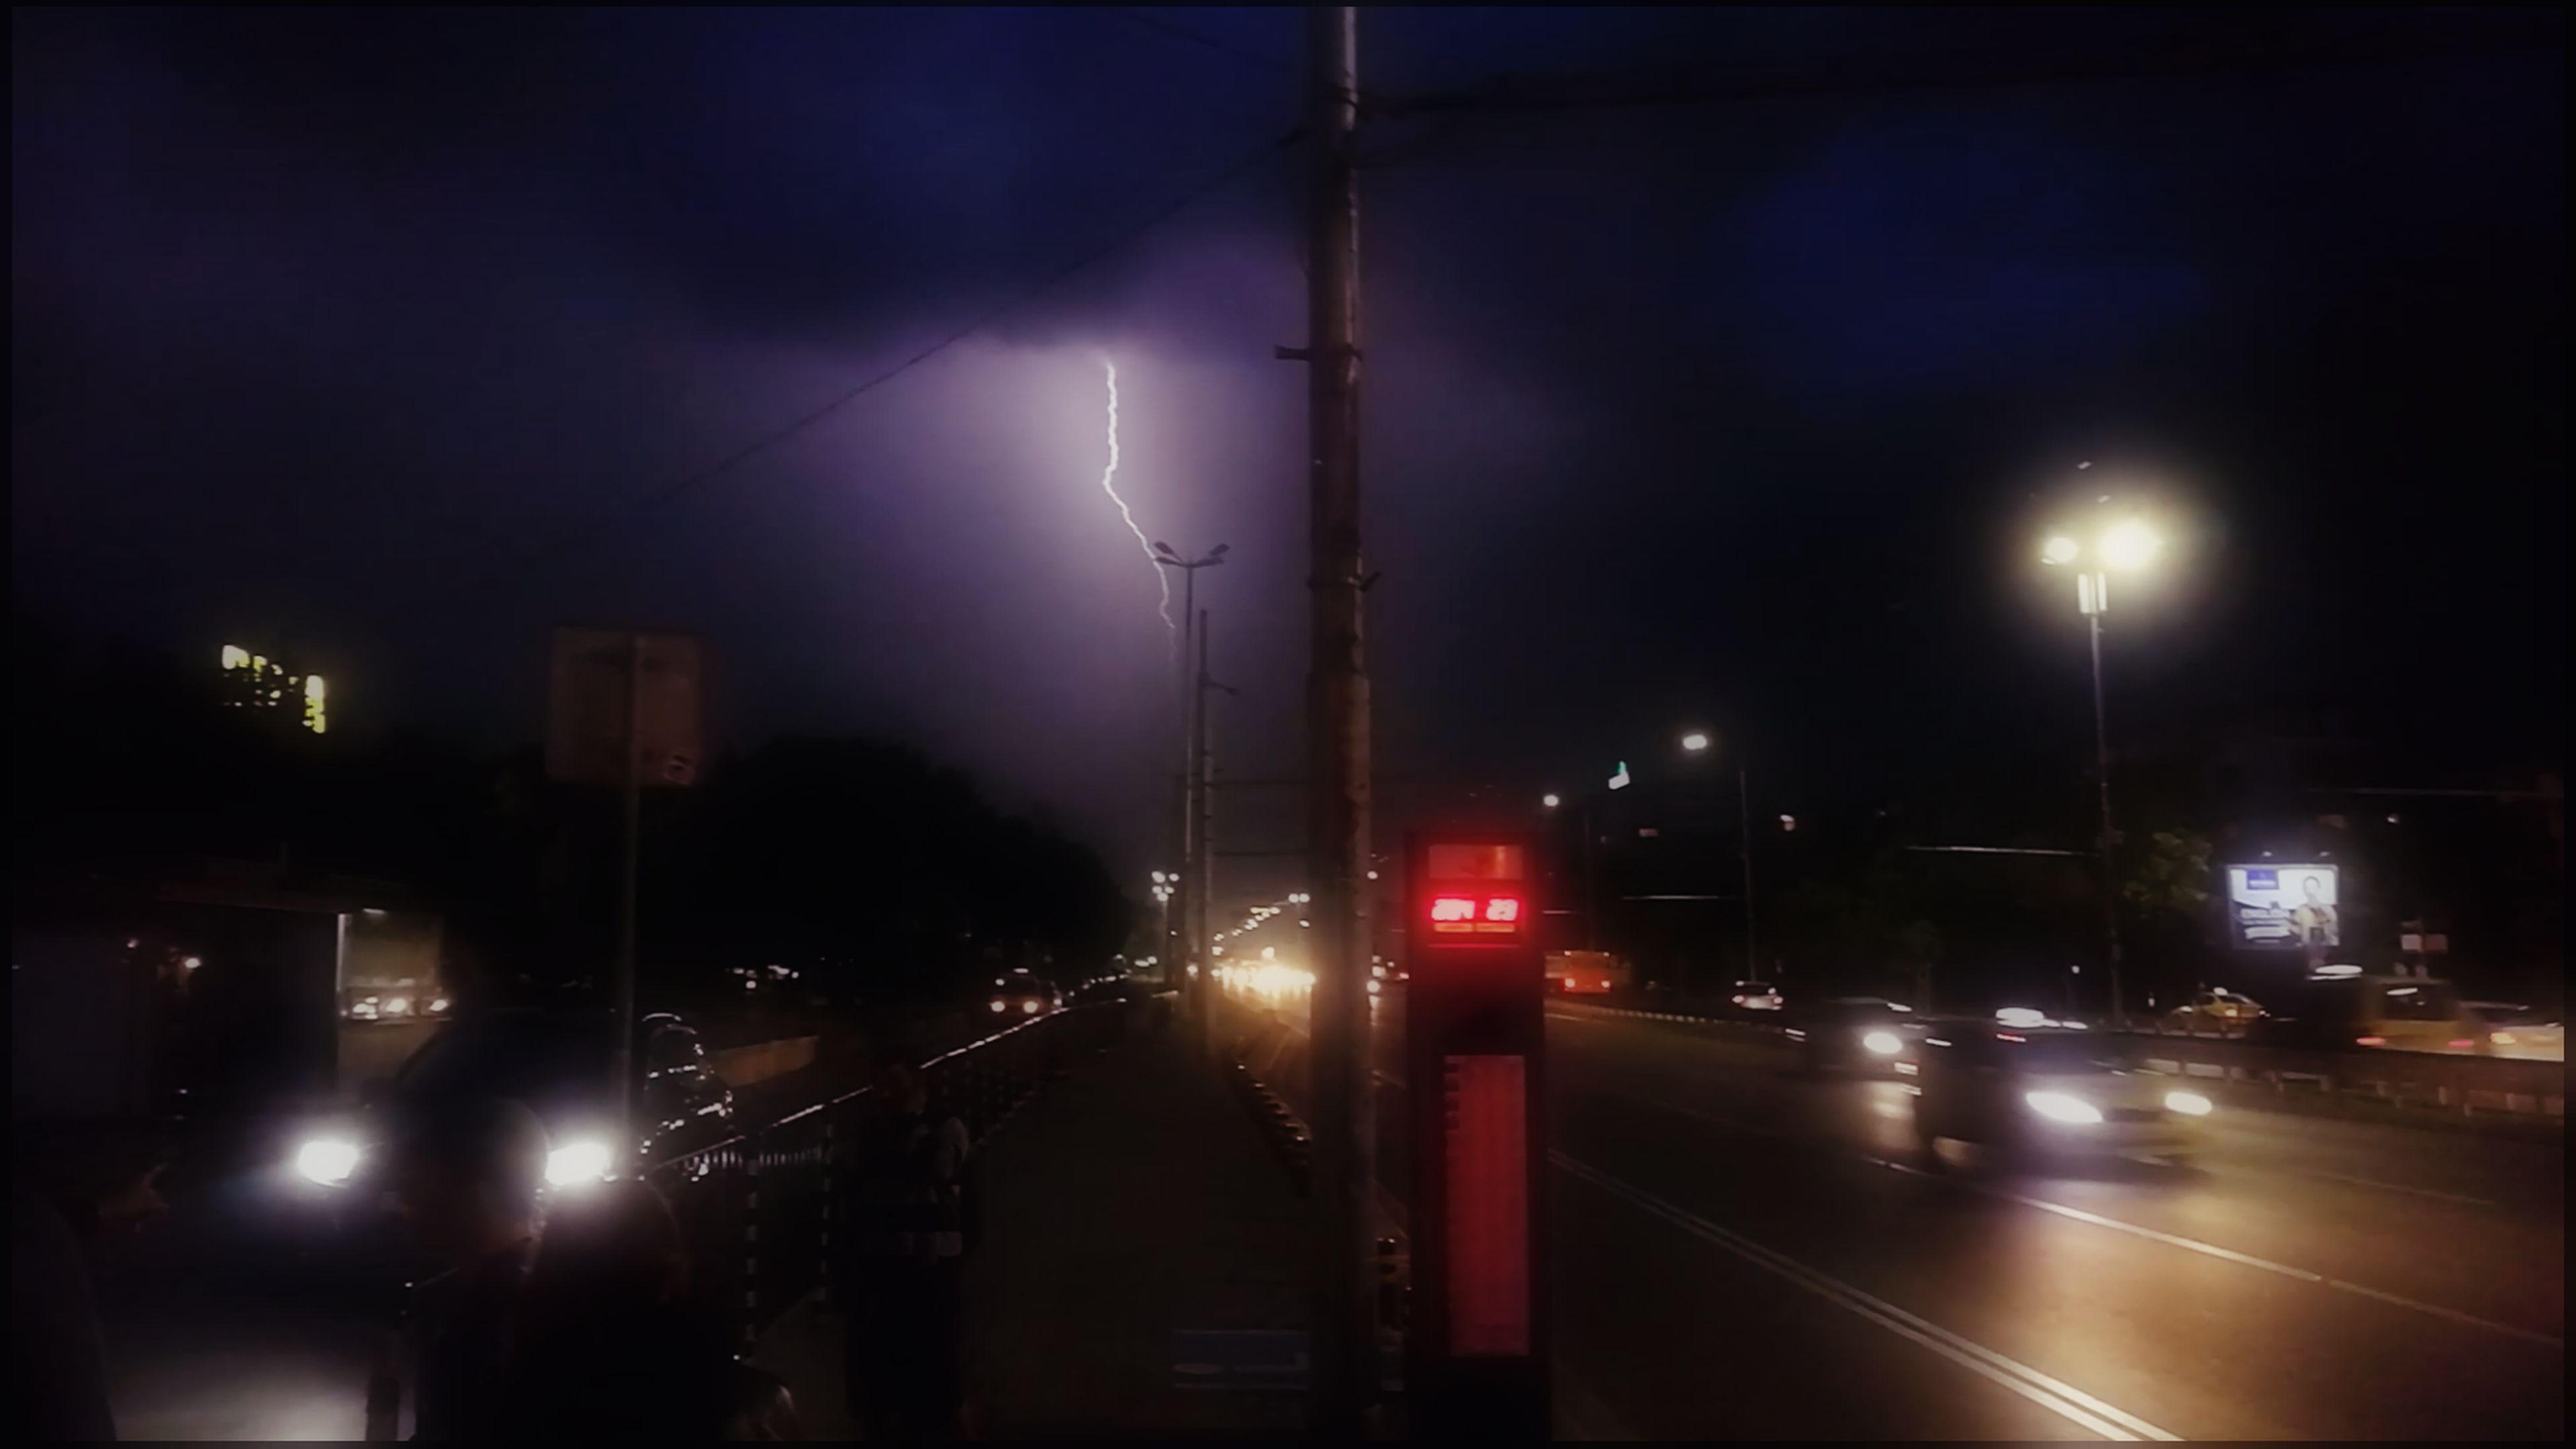 illuminated, night, transportation, mode of transport, land vehicle, no people, car, rail transportation, outdoors, road, sky, city